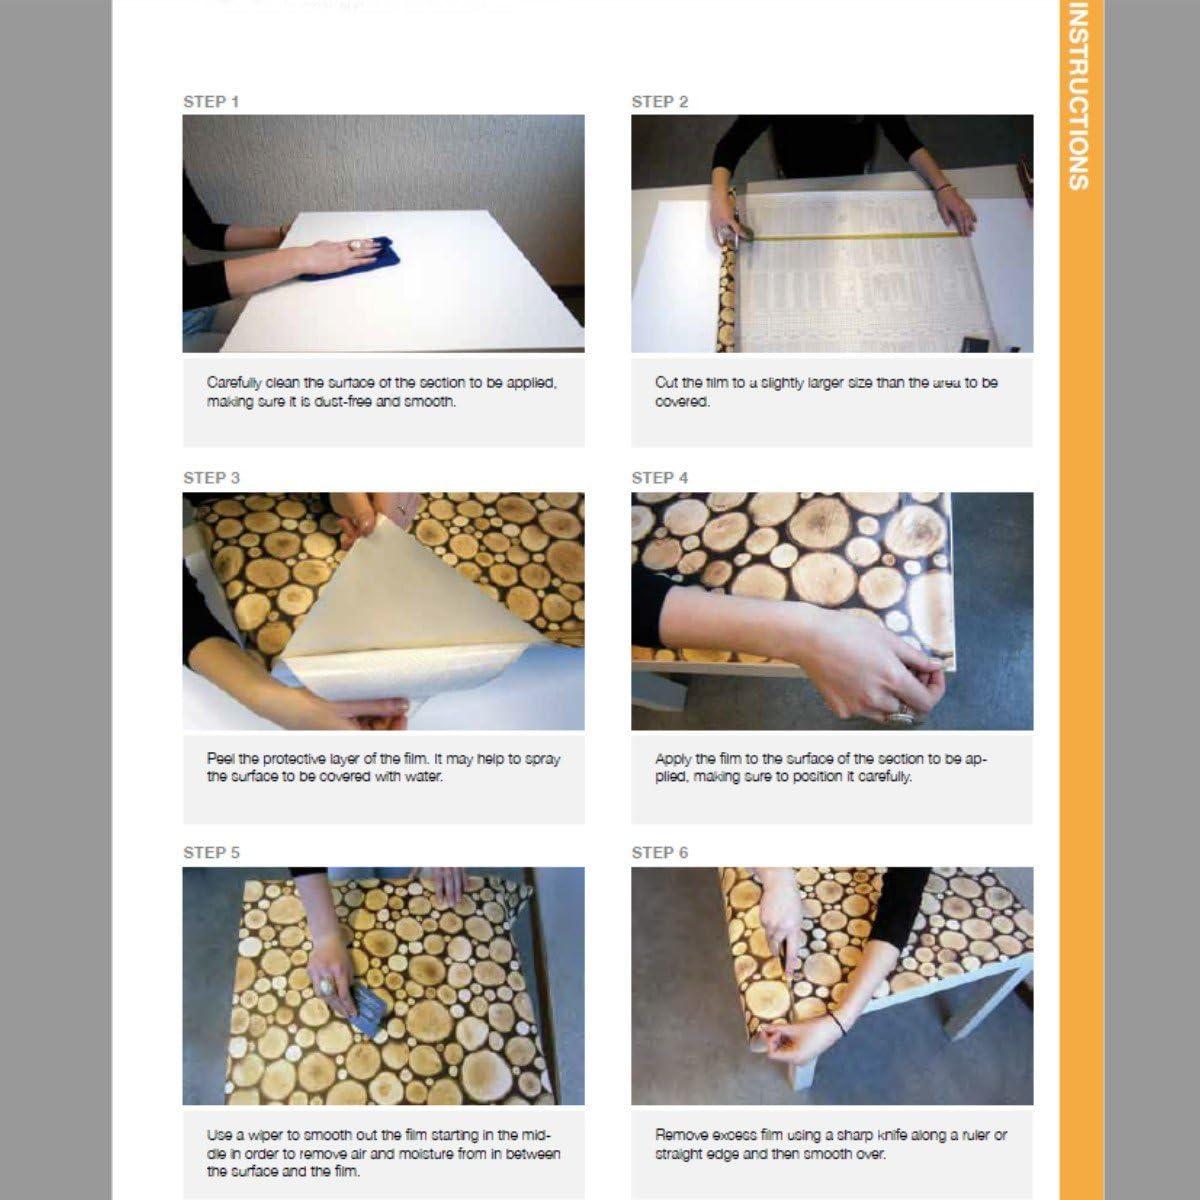 Klebefolie - Möbelfolie Edelstahl Optik - Stahl gebürstet - 17.17 cm x 1170 cm